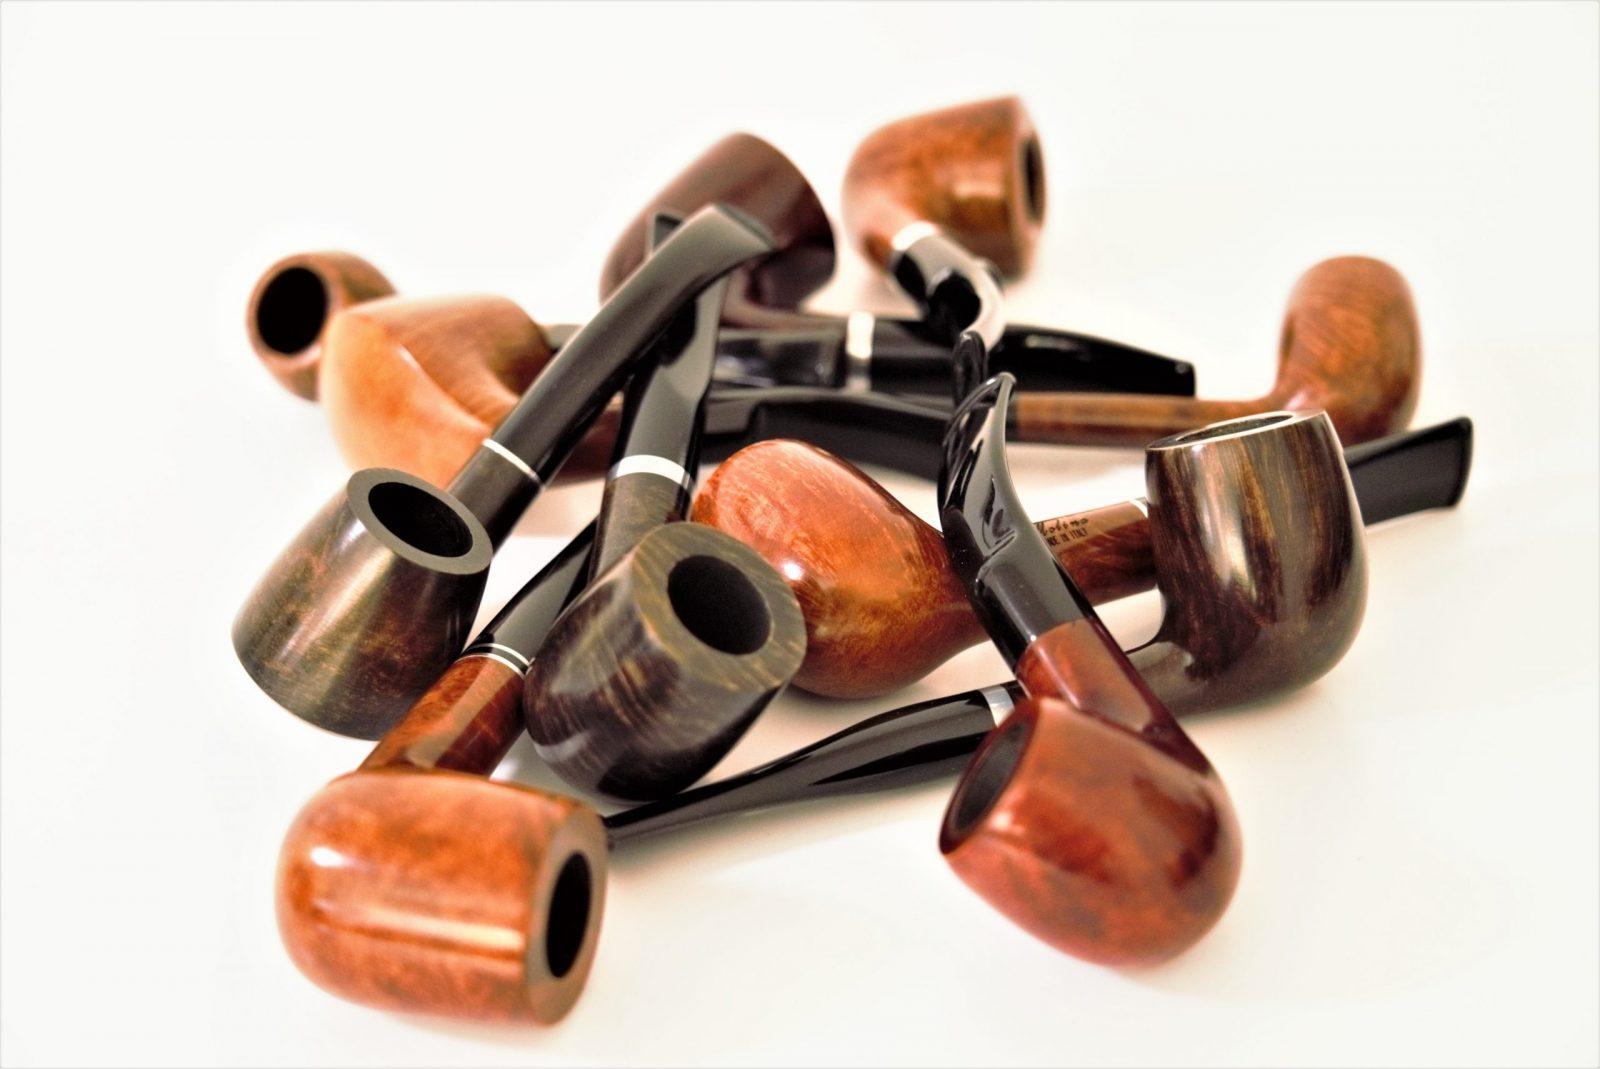 Starter pipes